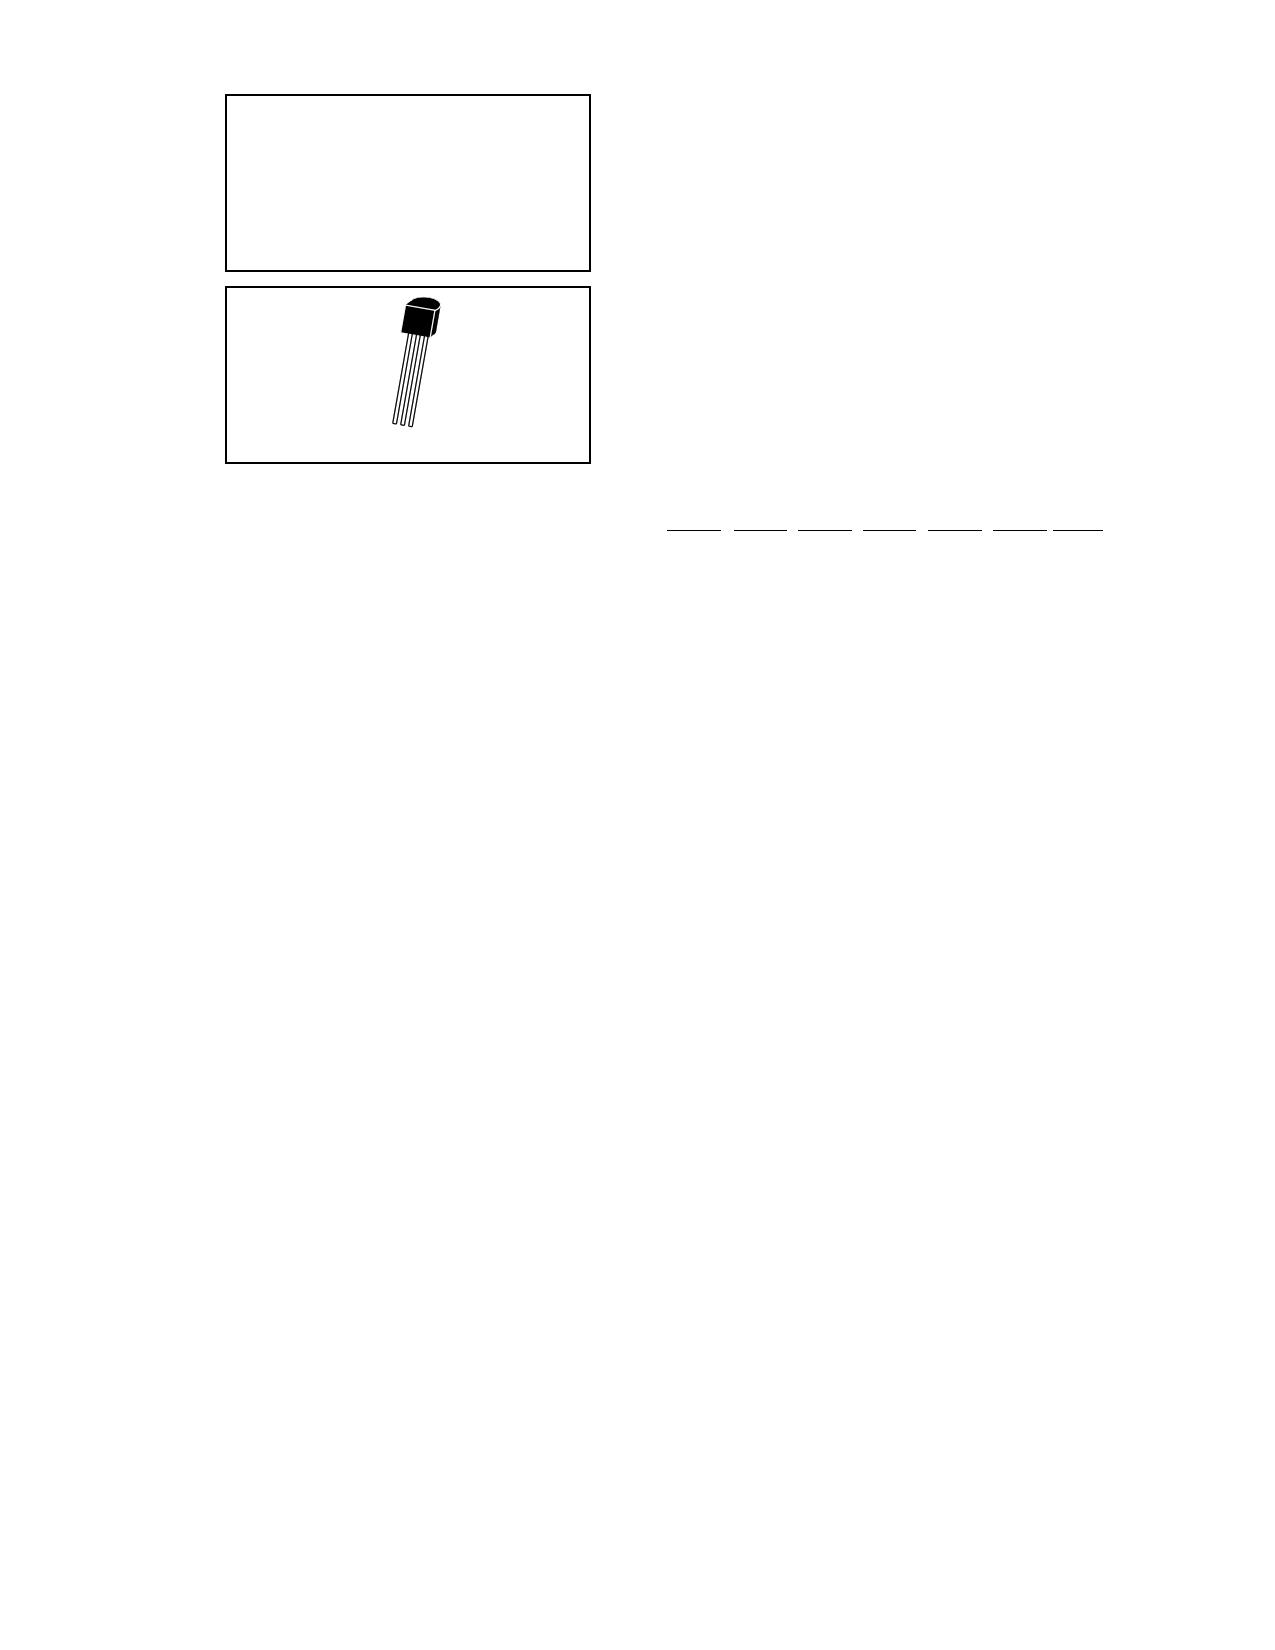 BRX47 Datasheet, BRX47 PDF,ピン配置, 機能